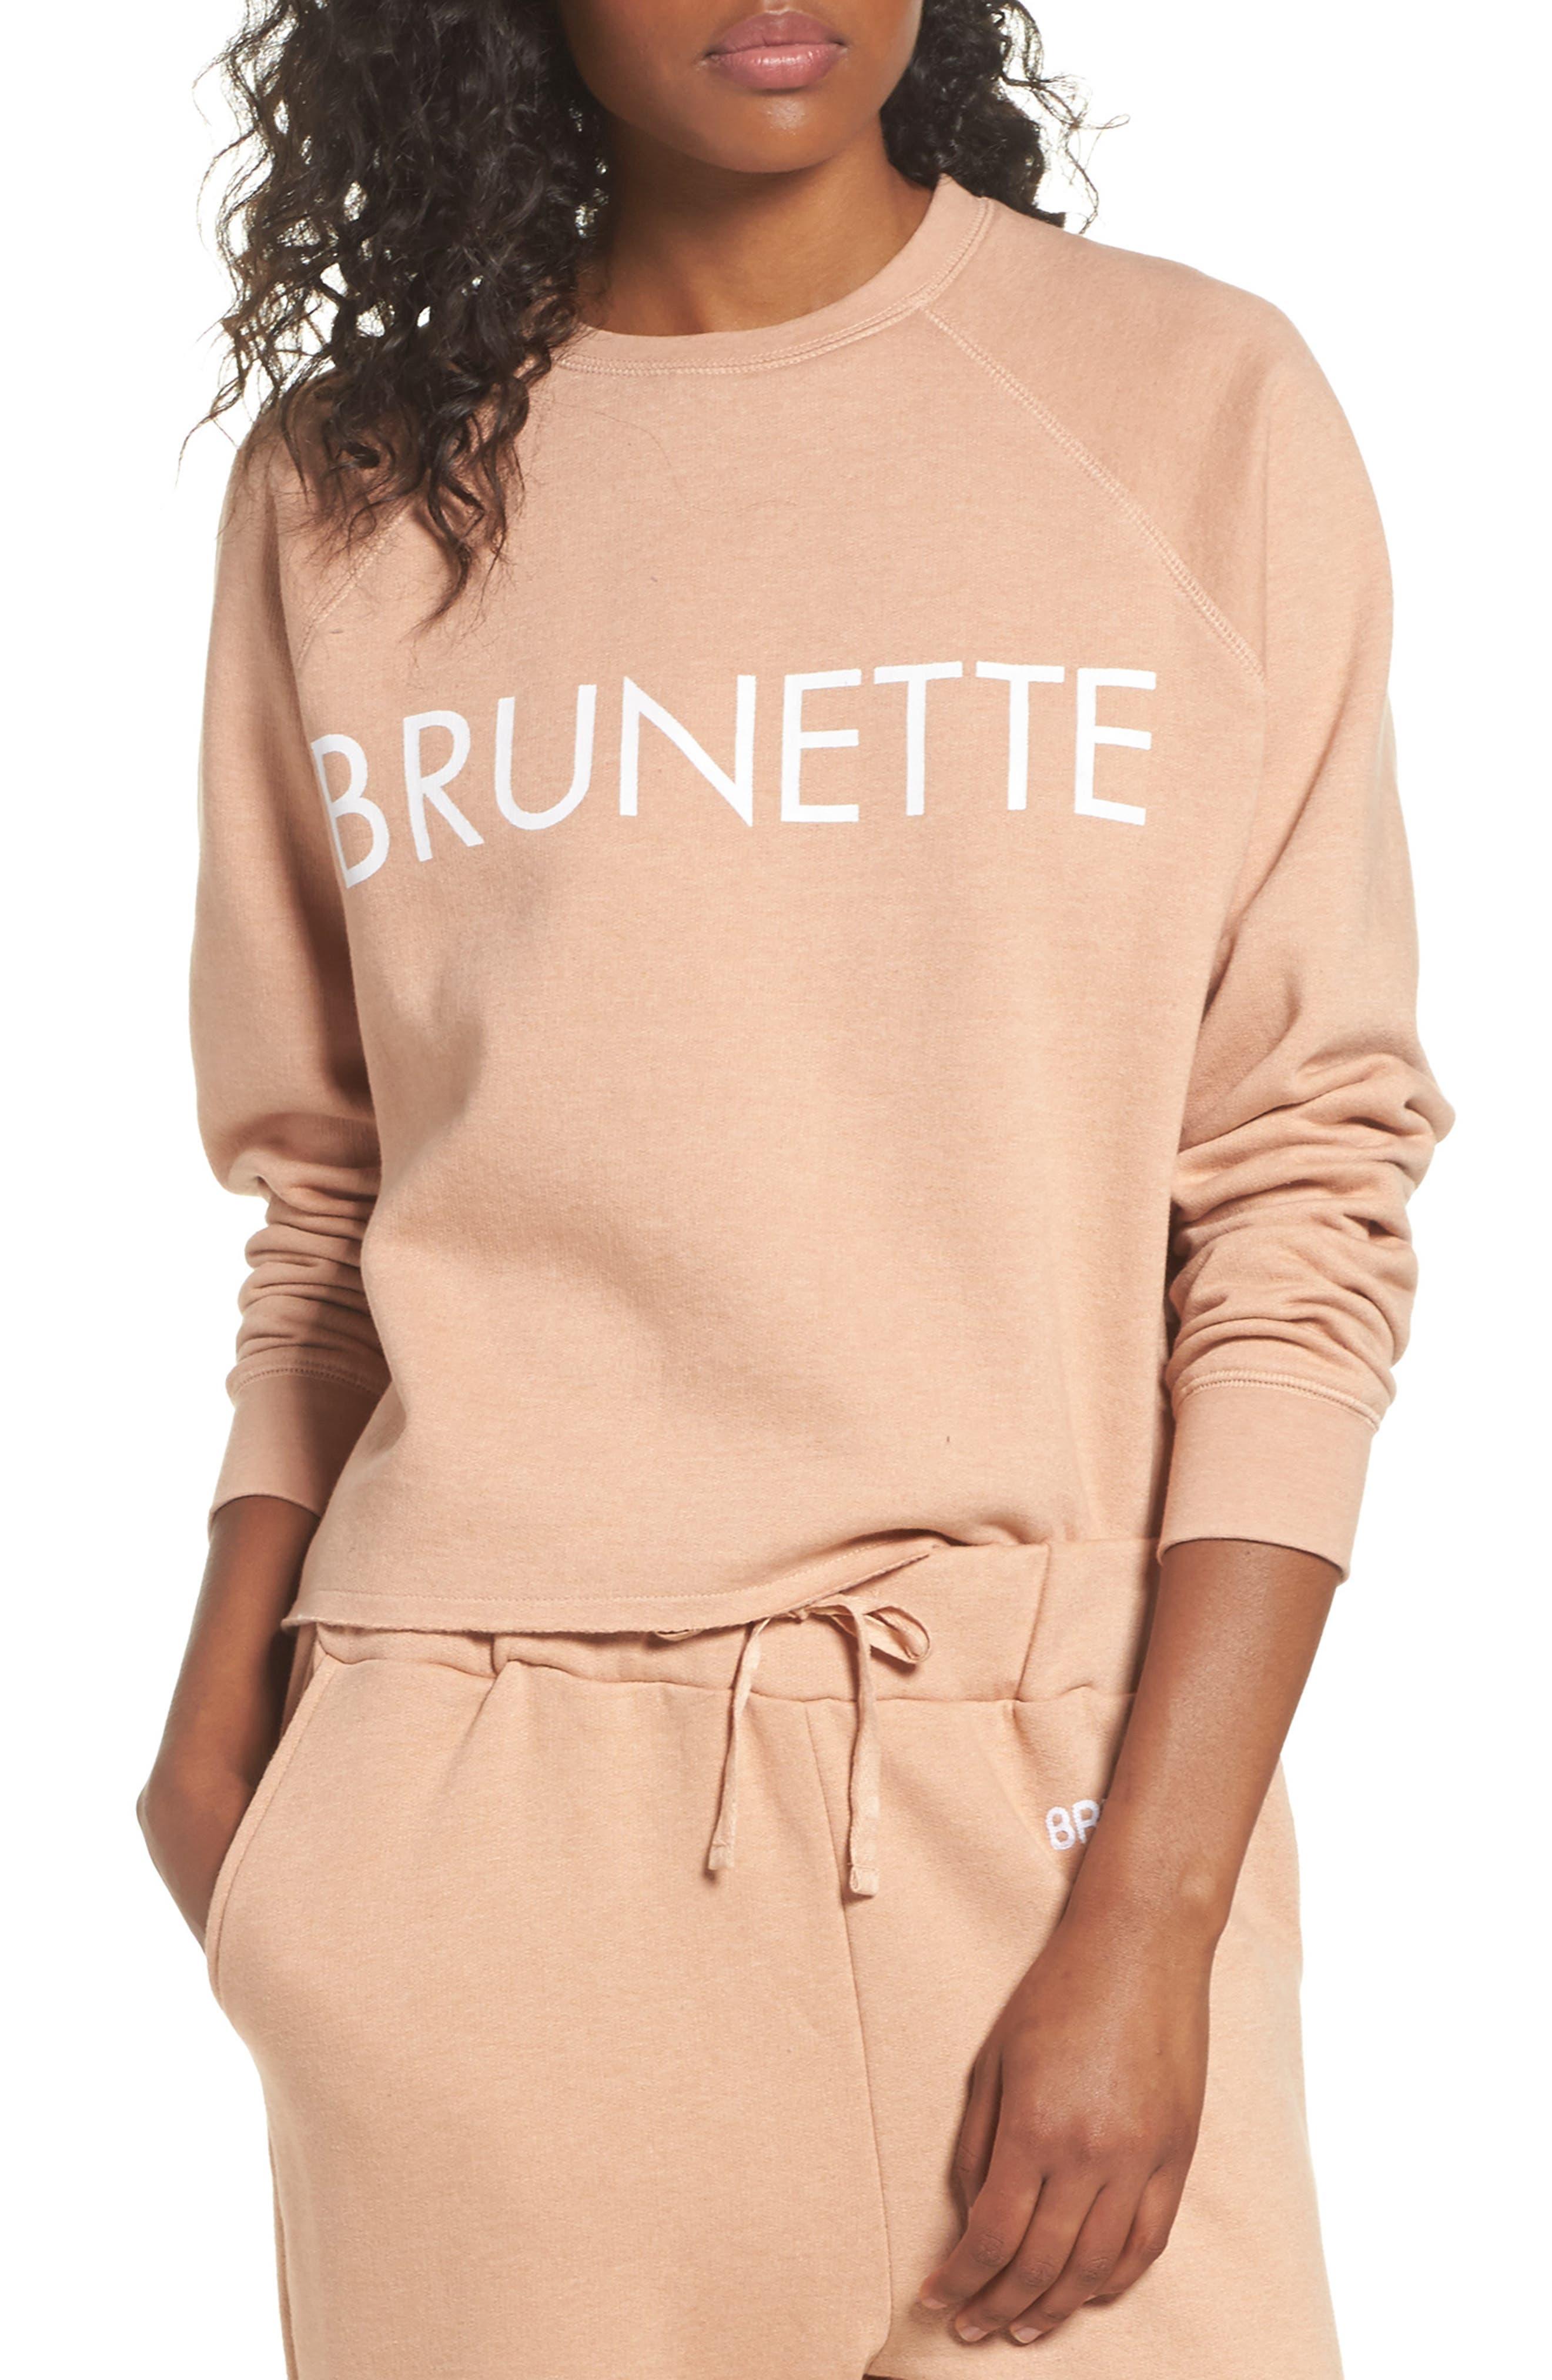 Middle Sister Brunette Sweatshirt,                             Main thumbnail 1, color,                             Rose